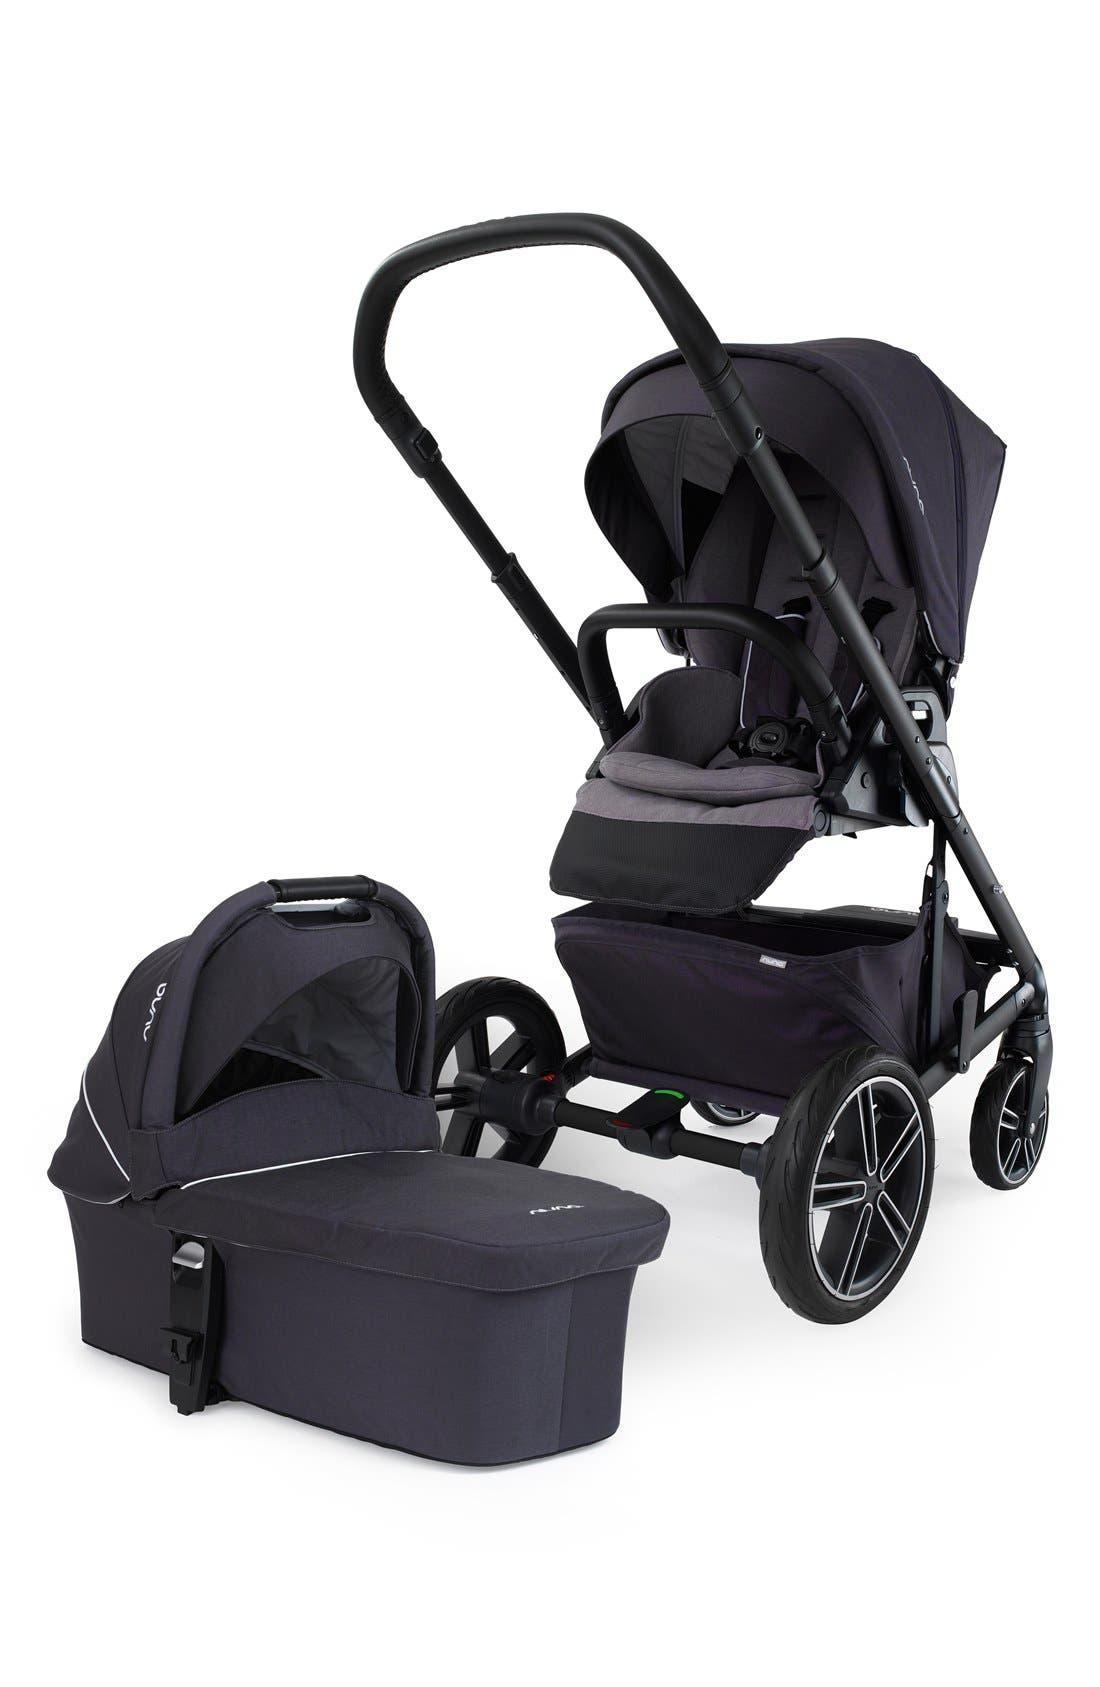 nuna 'MIXX™' Stroller System (Stroller & Bassinet)